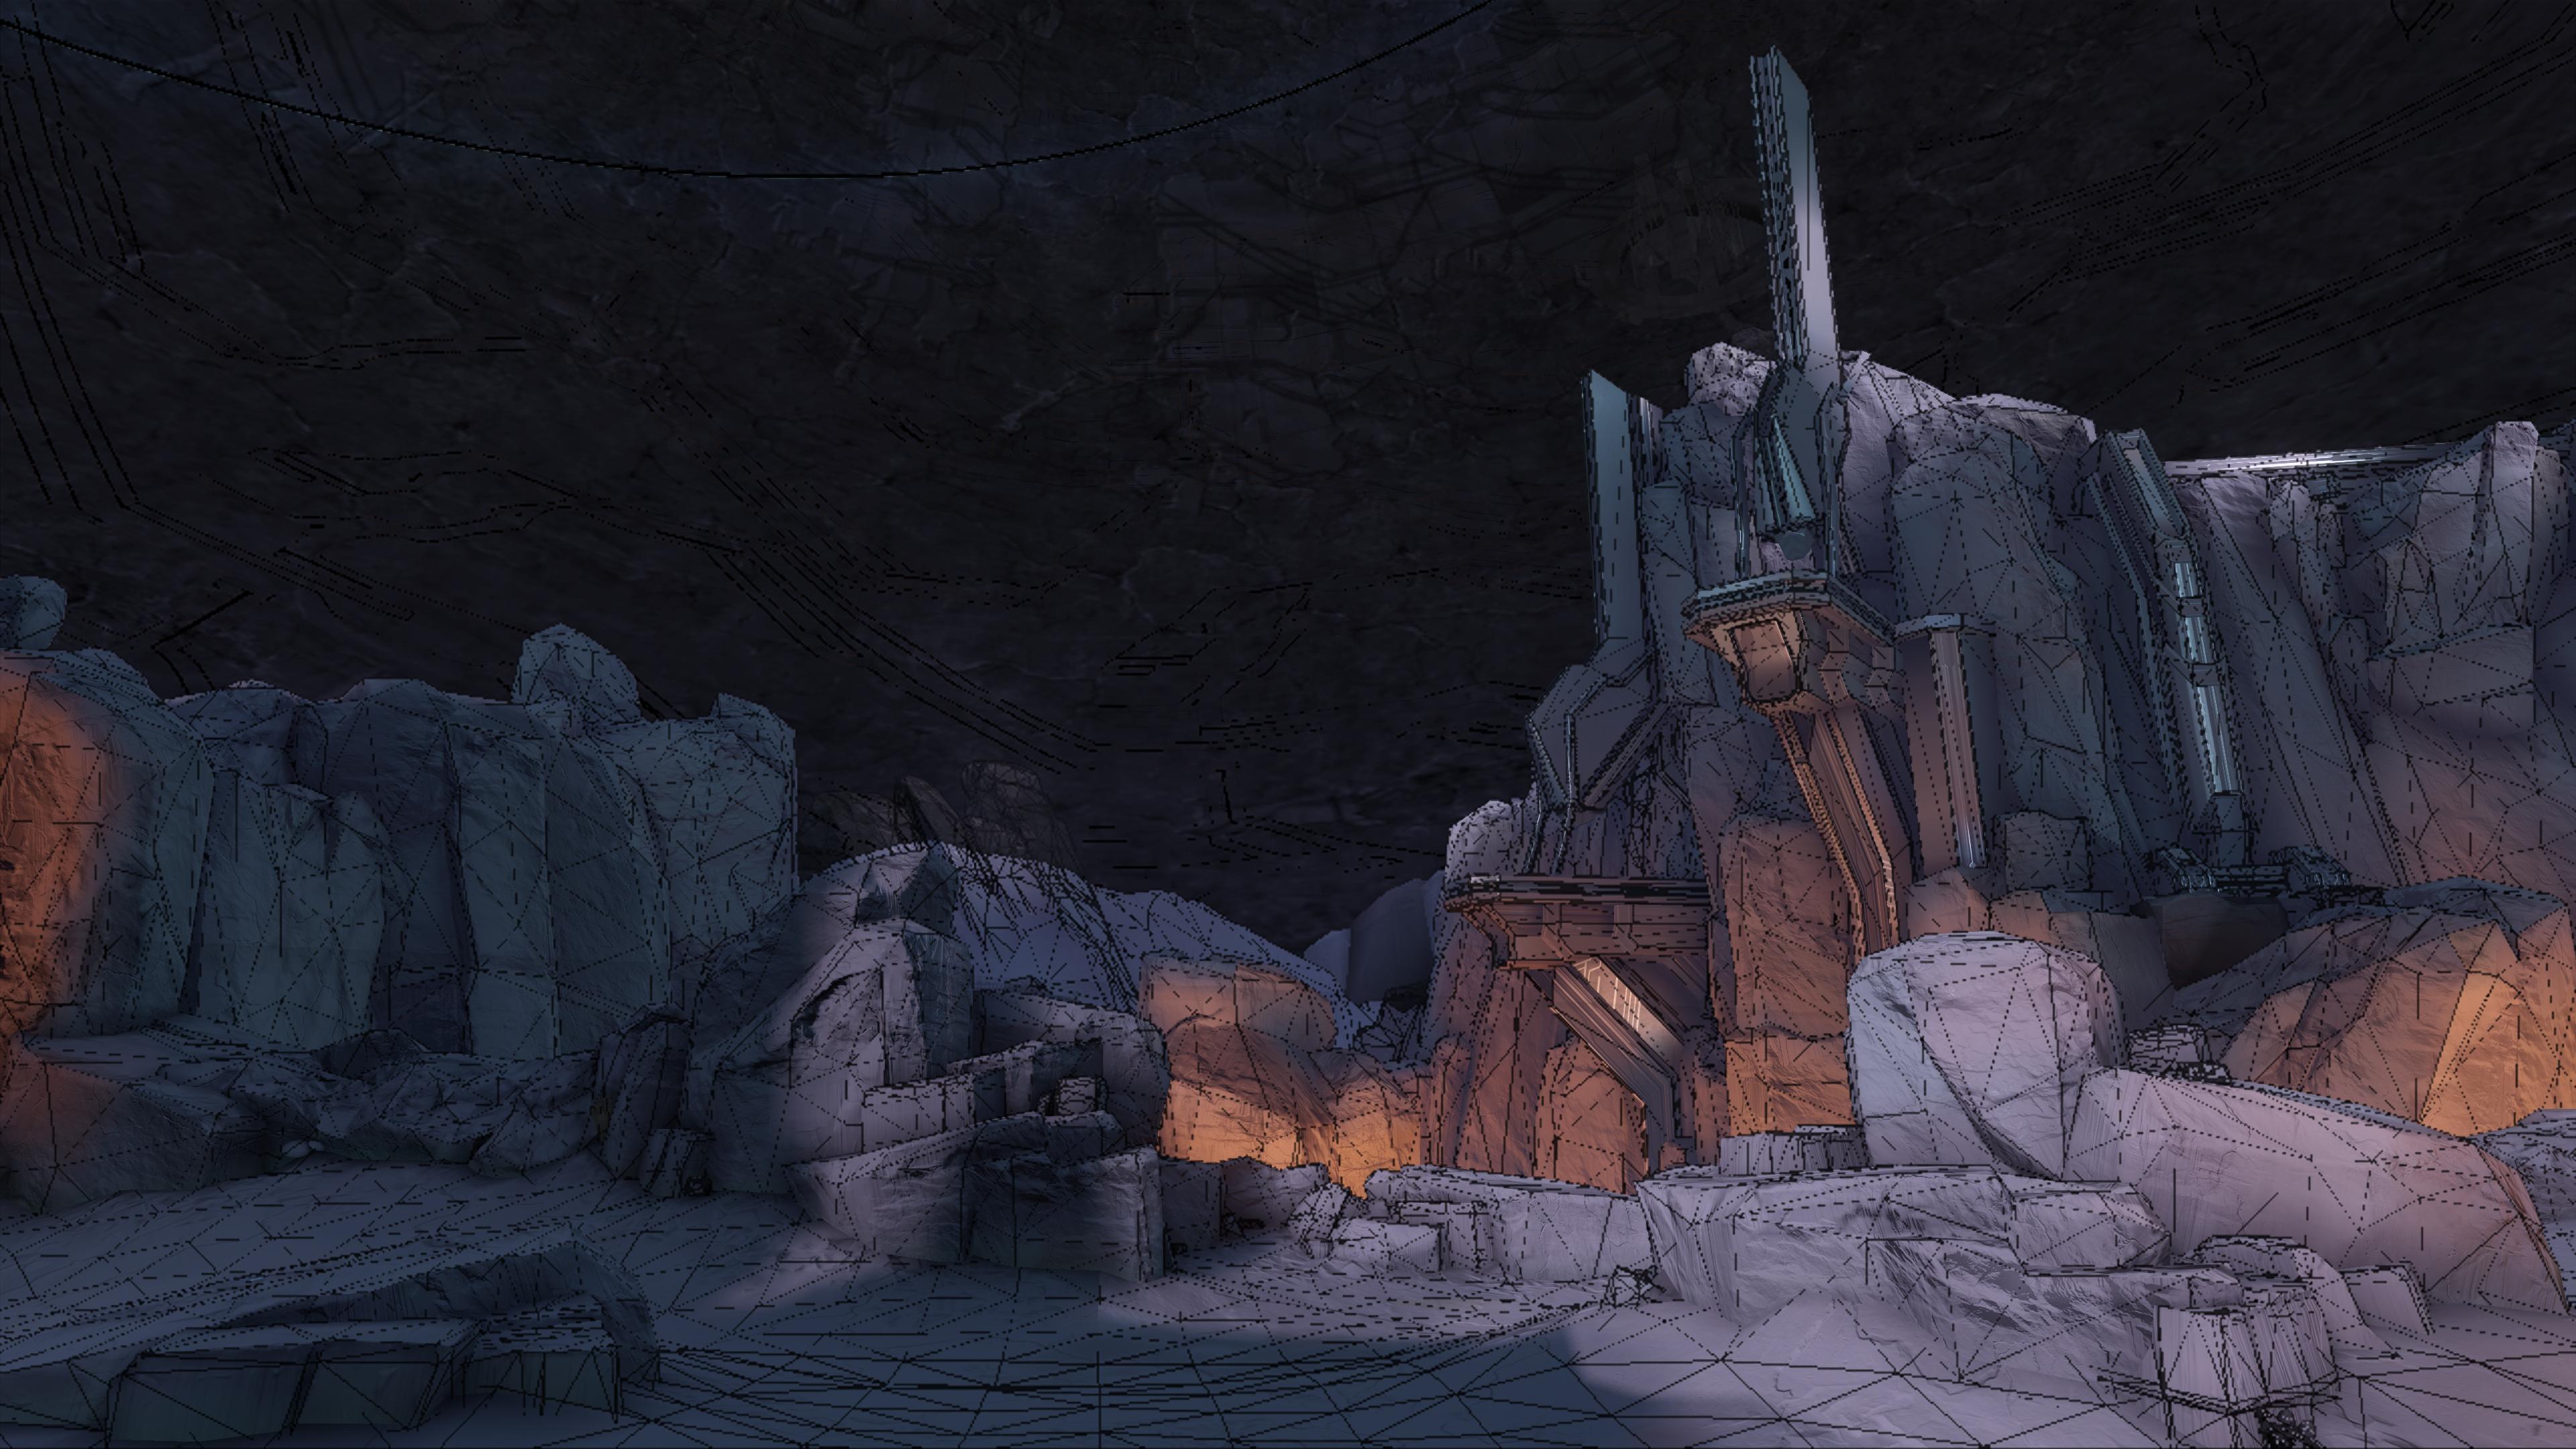 caves018AOWF